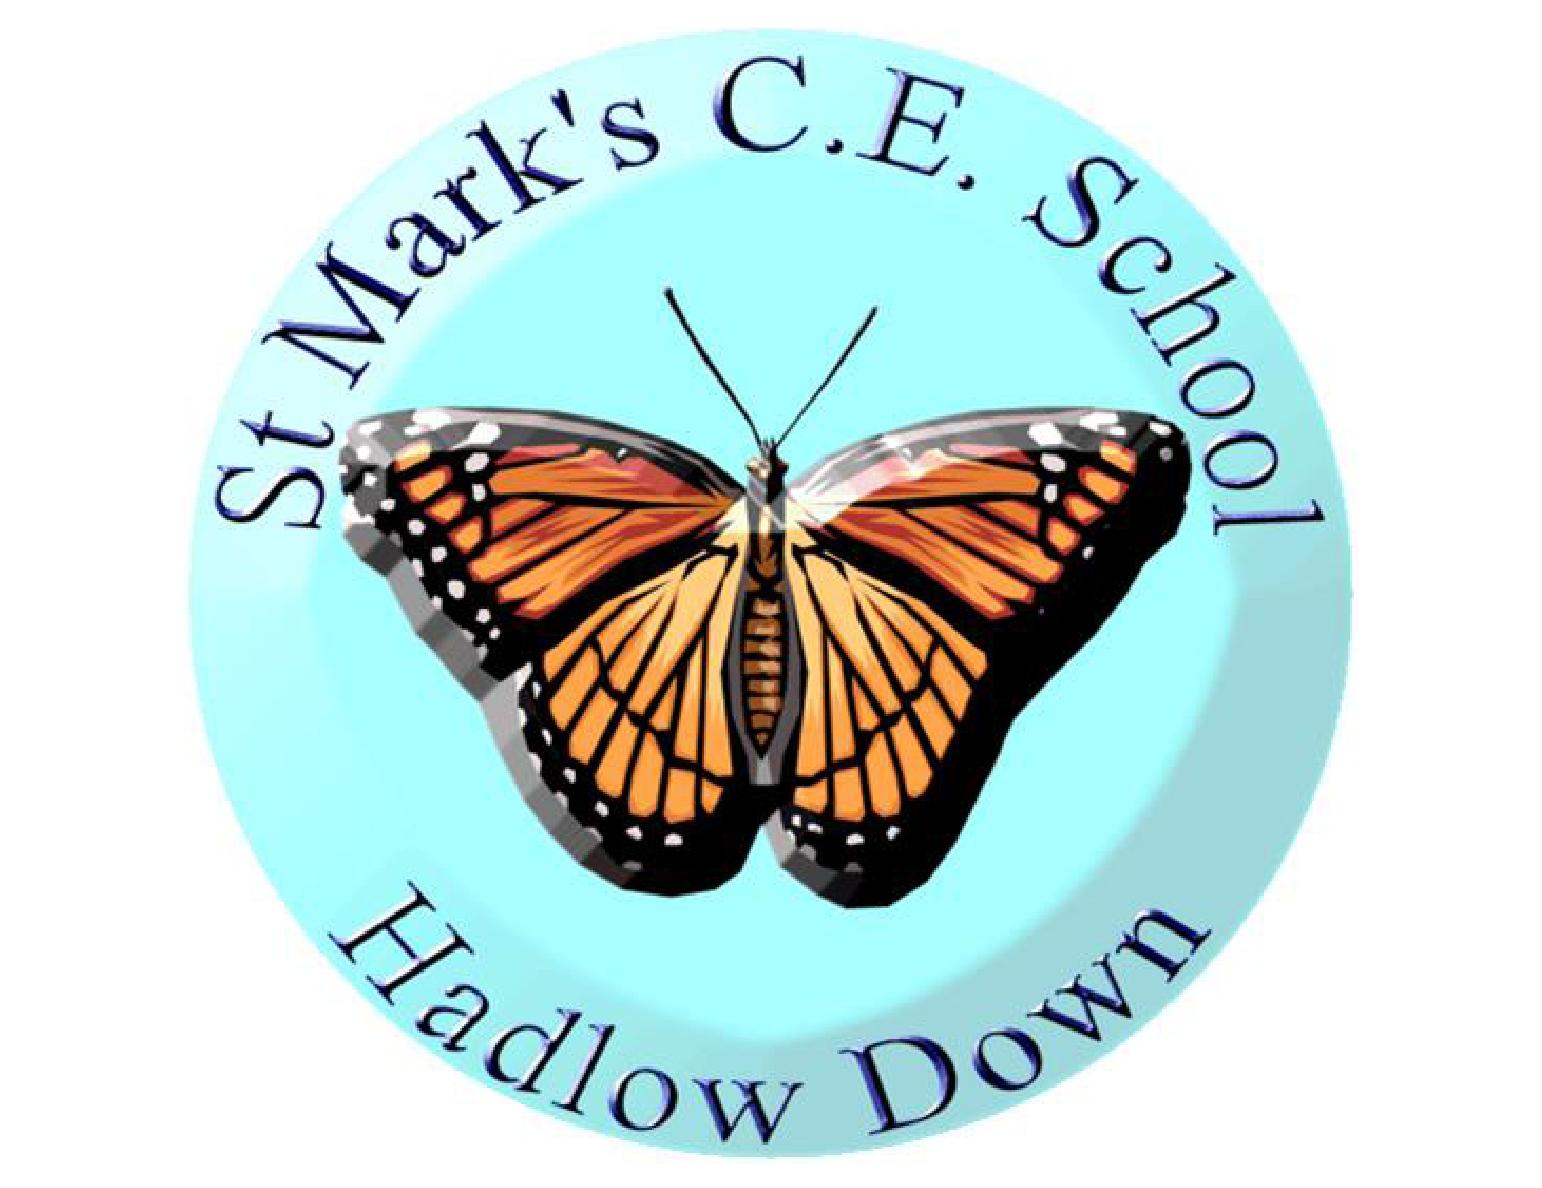 st marks hadlow down ready - Uckfield News